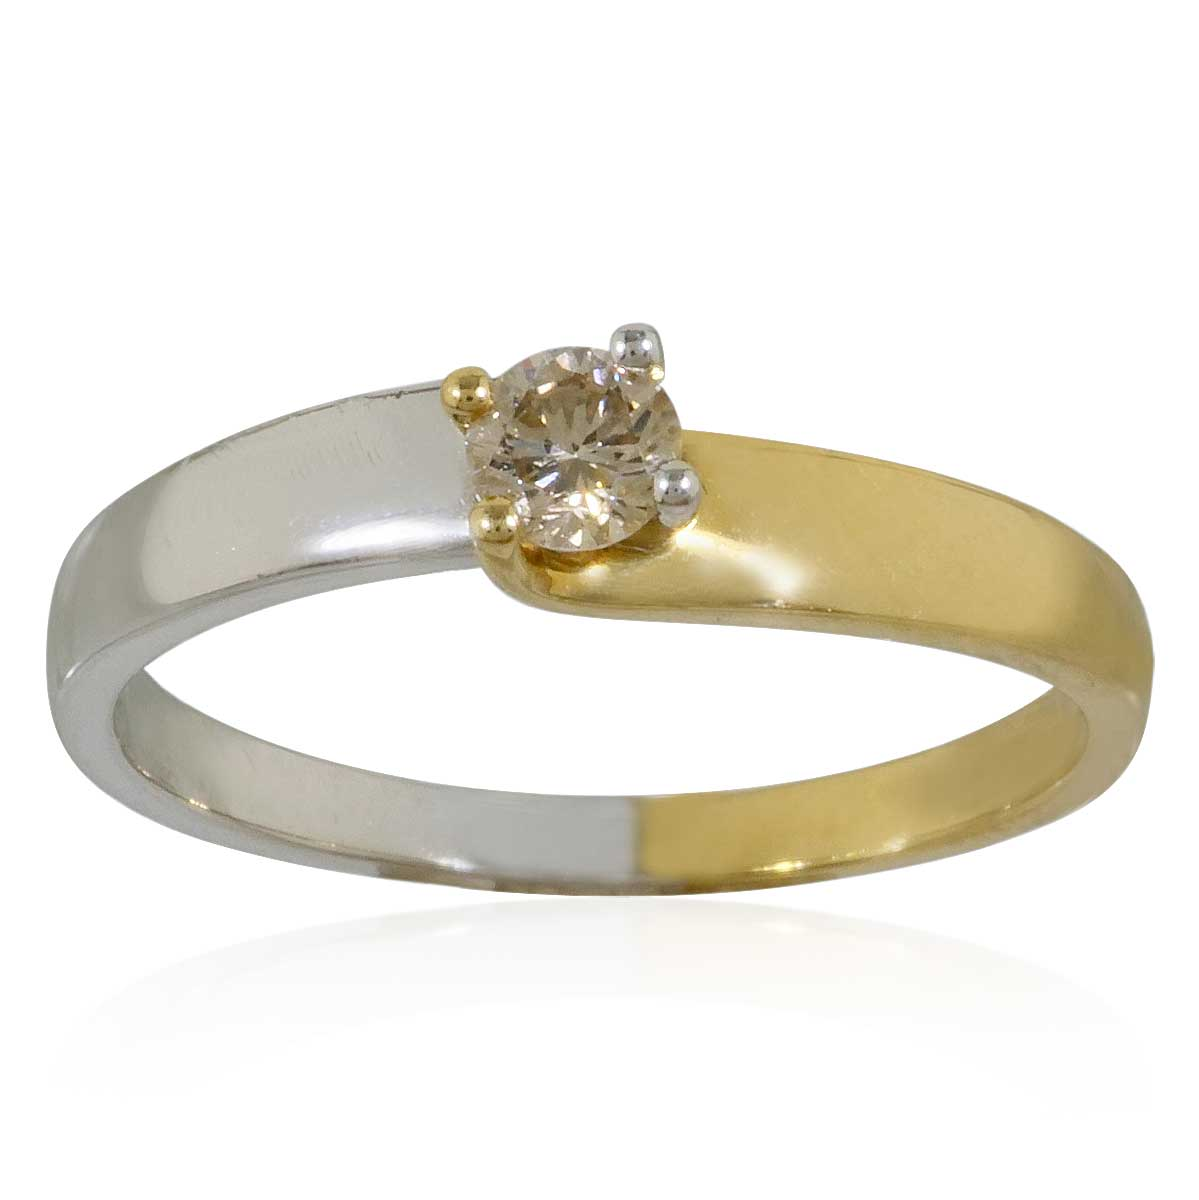 eternity ring halbmemory mit 0 63ct diamanten in gelbgold. Black Bedroom Furniture Sets. Home Design Ideas